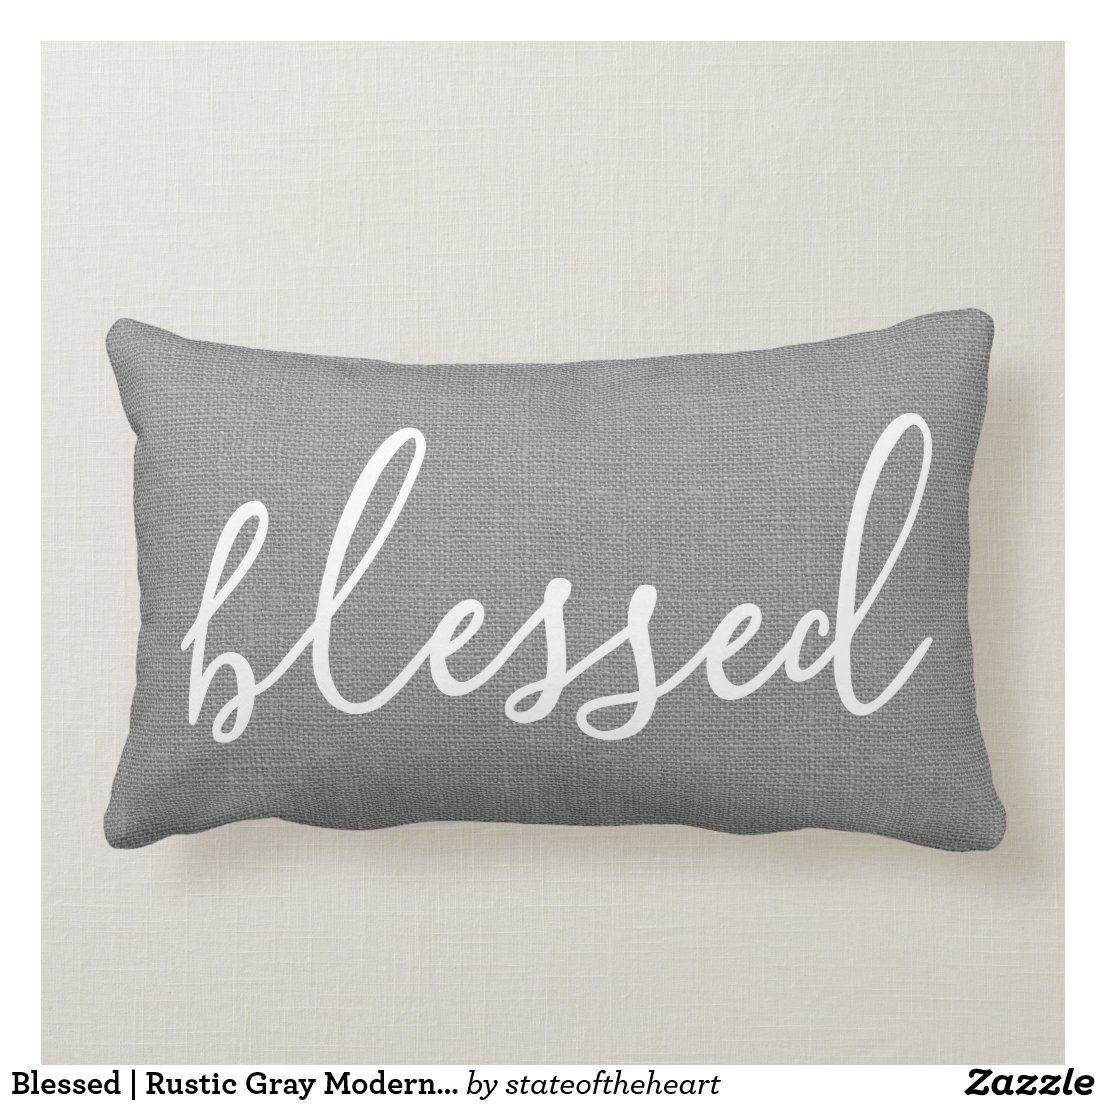 Blessed rustic gray modern farmhouse lumbar pillow